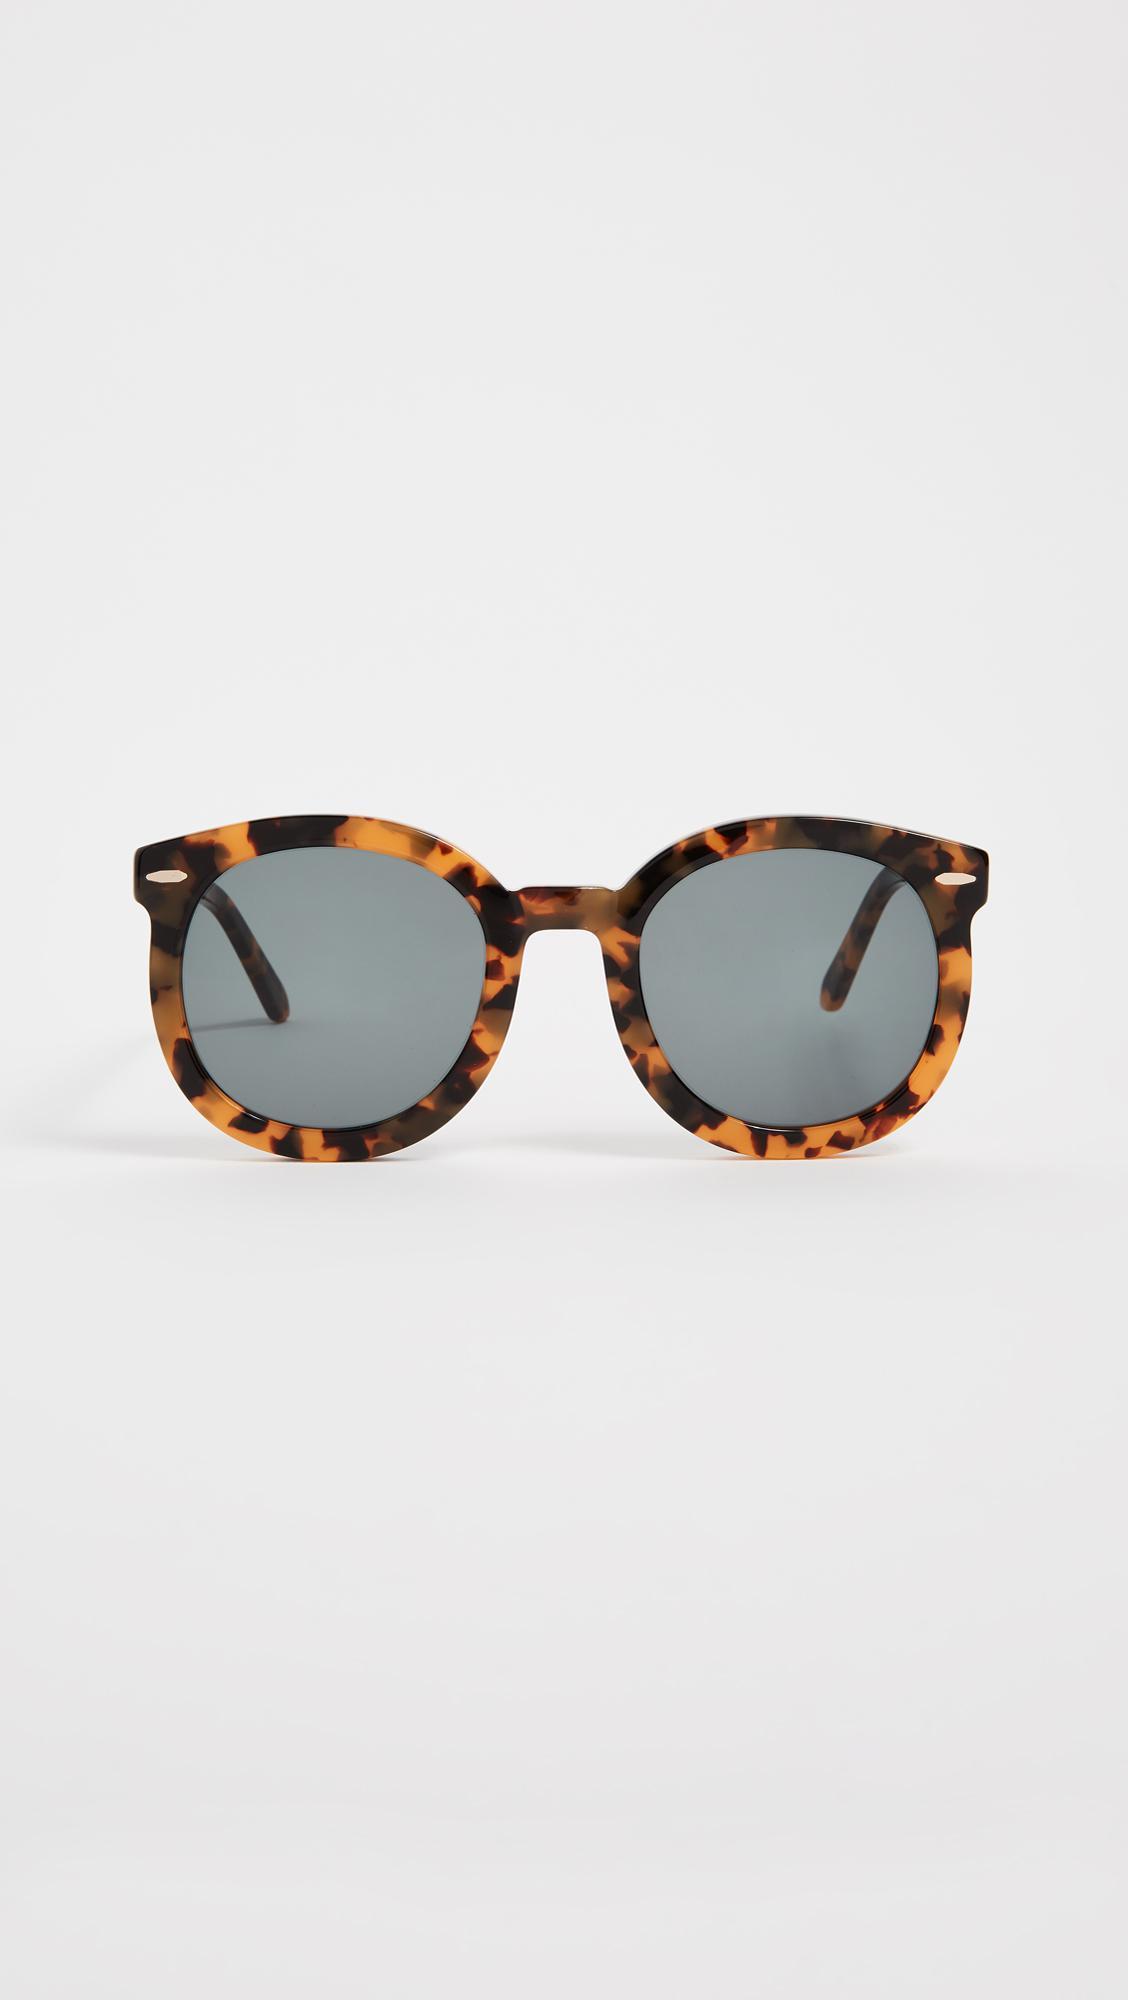 1c73358832 Karen Walker Super Duper Strength Sunglasses in Brown - Lyst